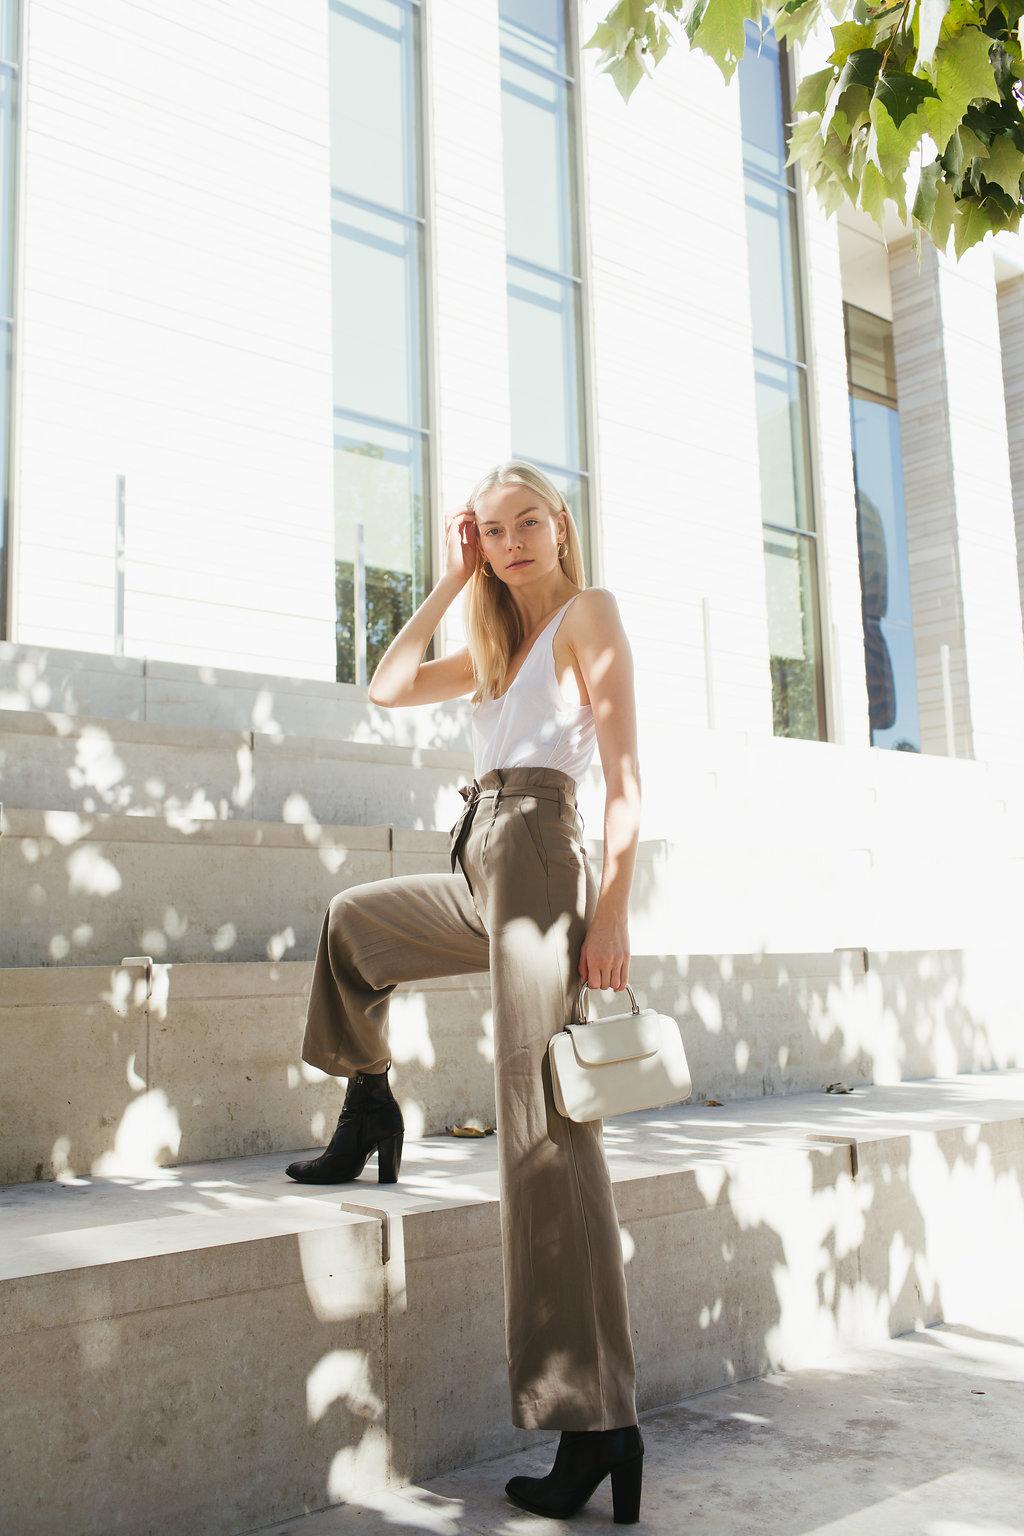 Paige-Newton-Austin-Model-Fashion-Photography0001.jpg